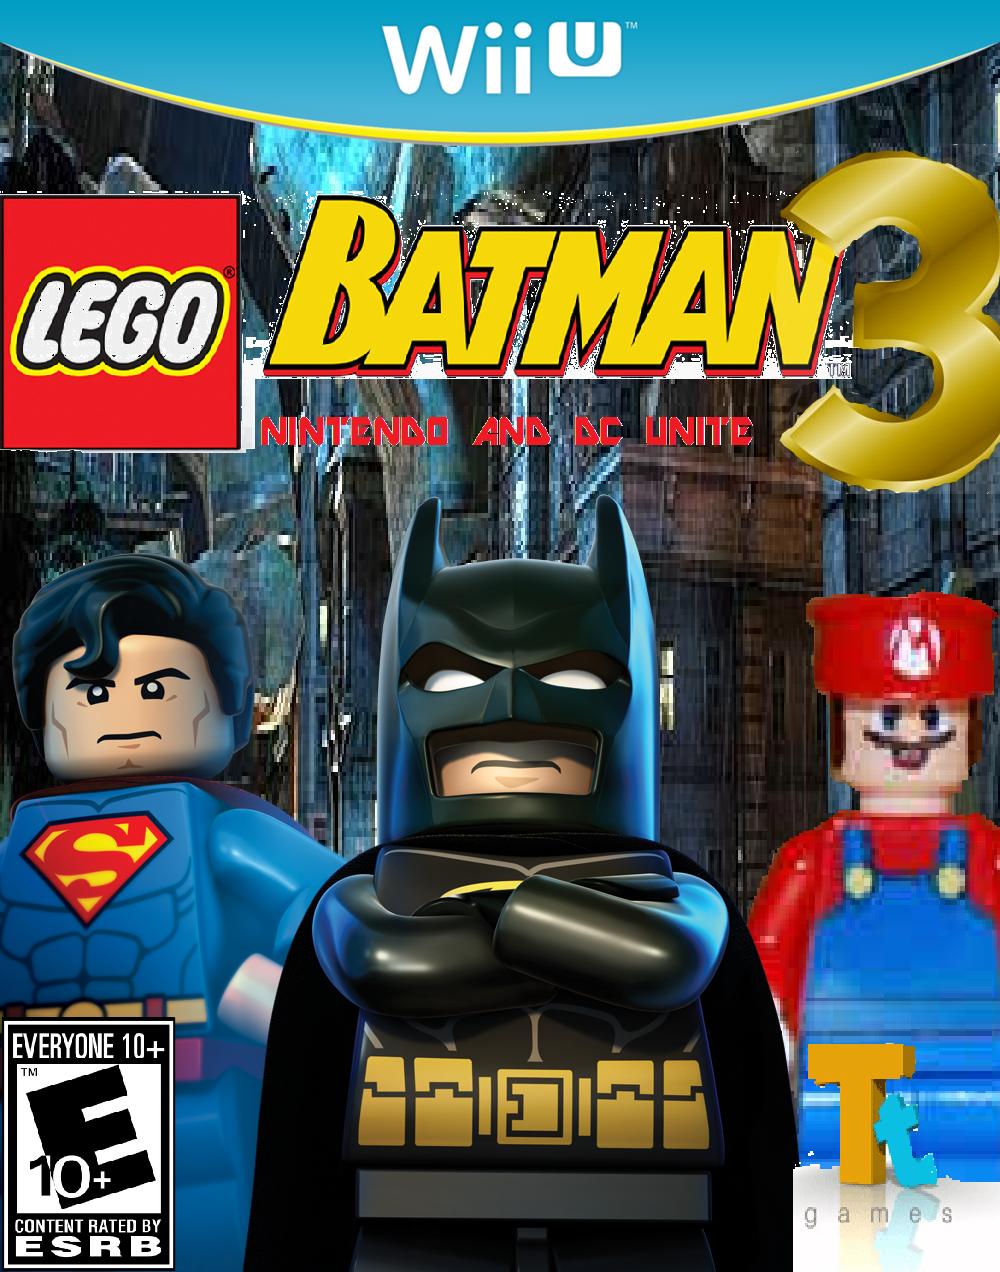 Lego Batman 3: Nintendo and DC Unite